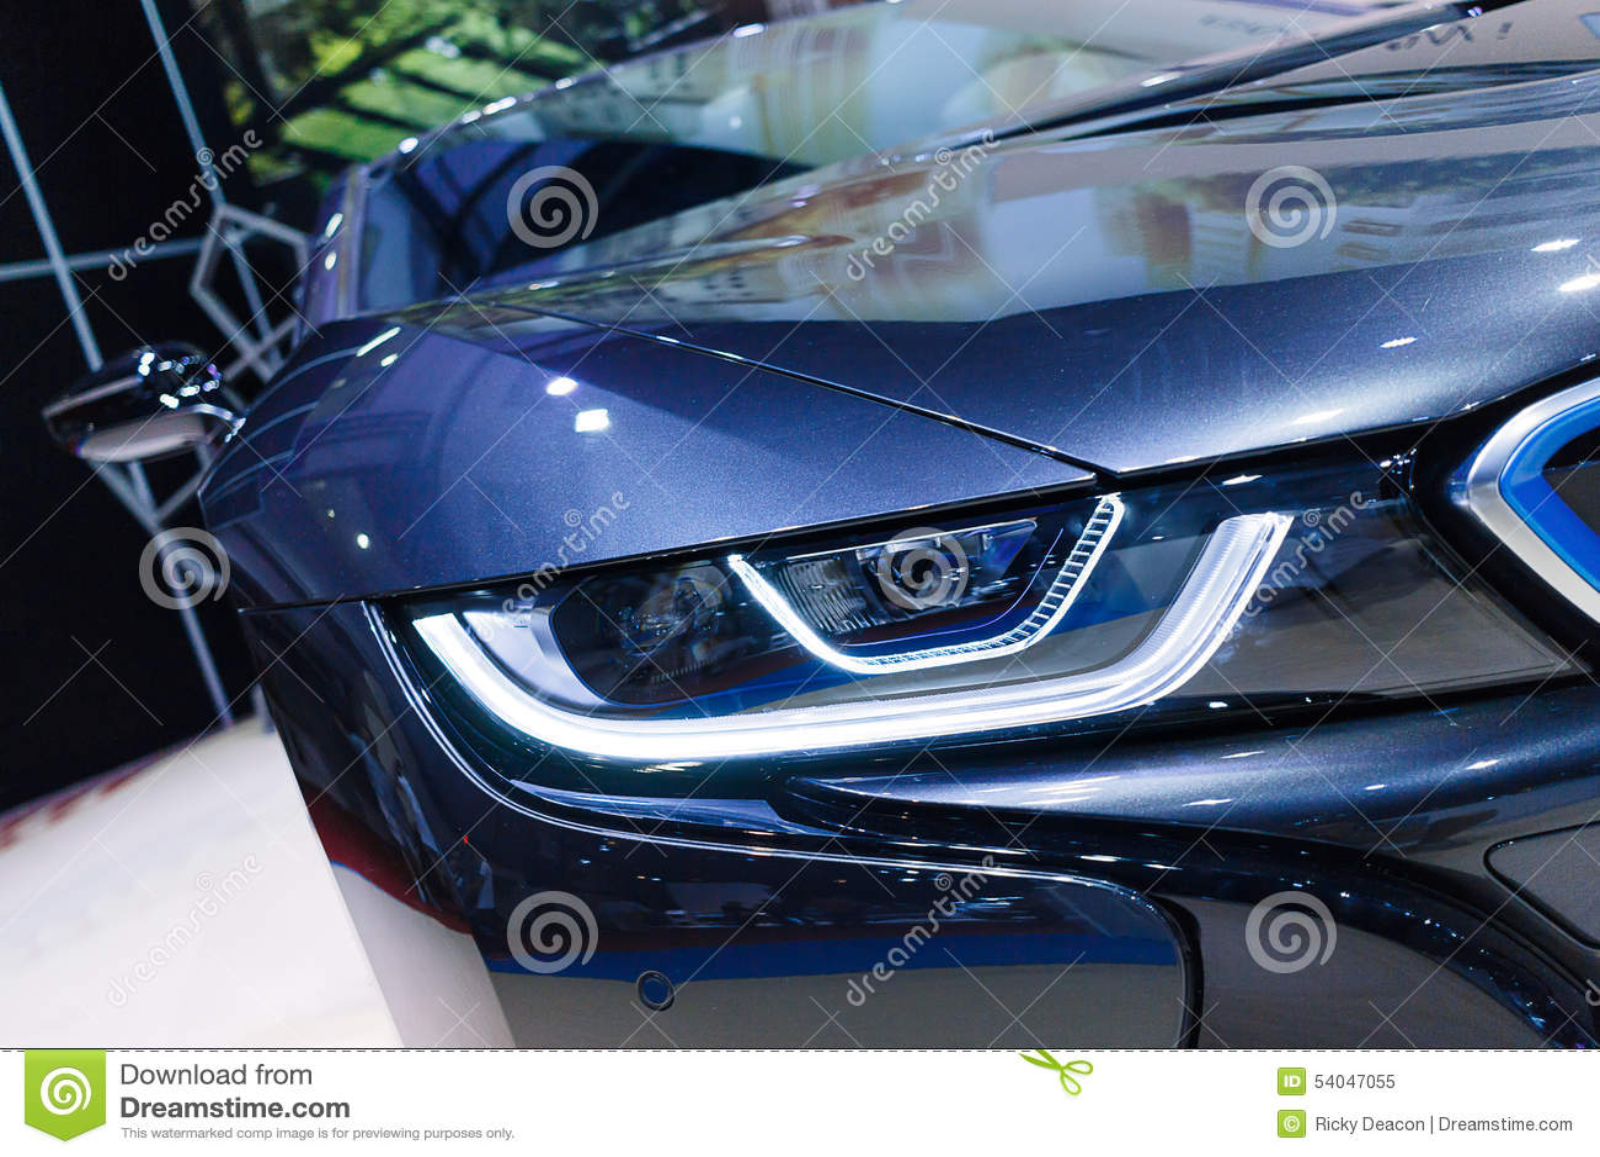 Bmw I8 Stock Image Image Of Closeup Future Electric 54047055